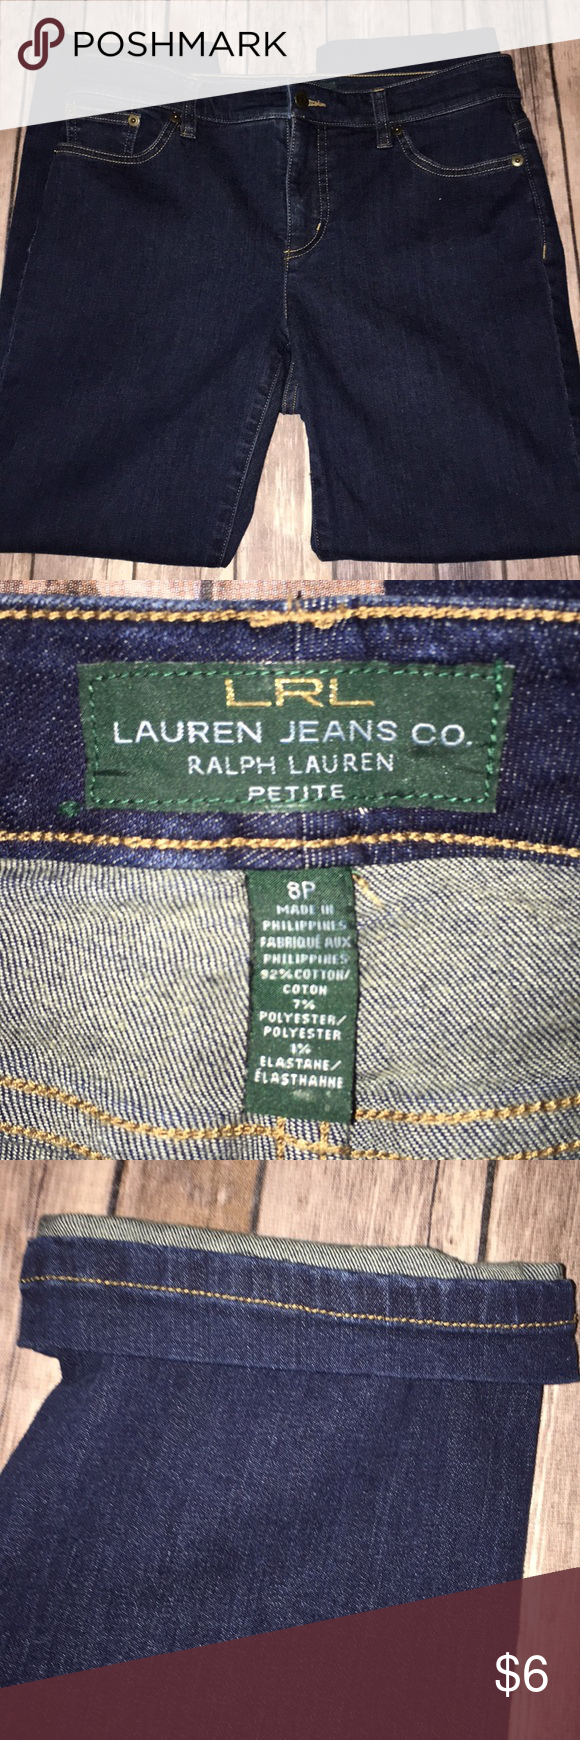 online store first rate large discount LRL Lauren Jeans Co Ralph Lauren petite jeans 8P LRL Lauren ...